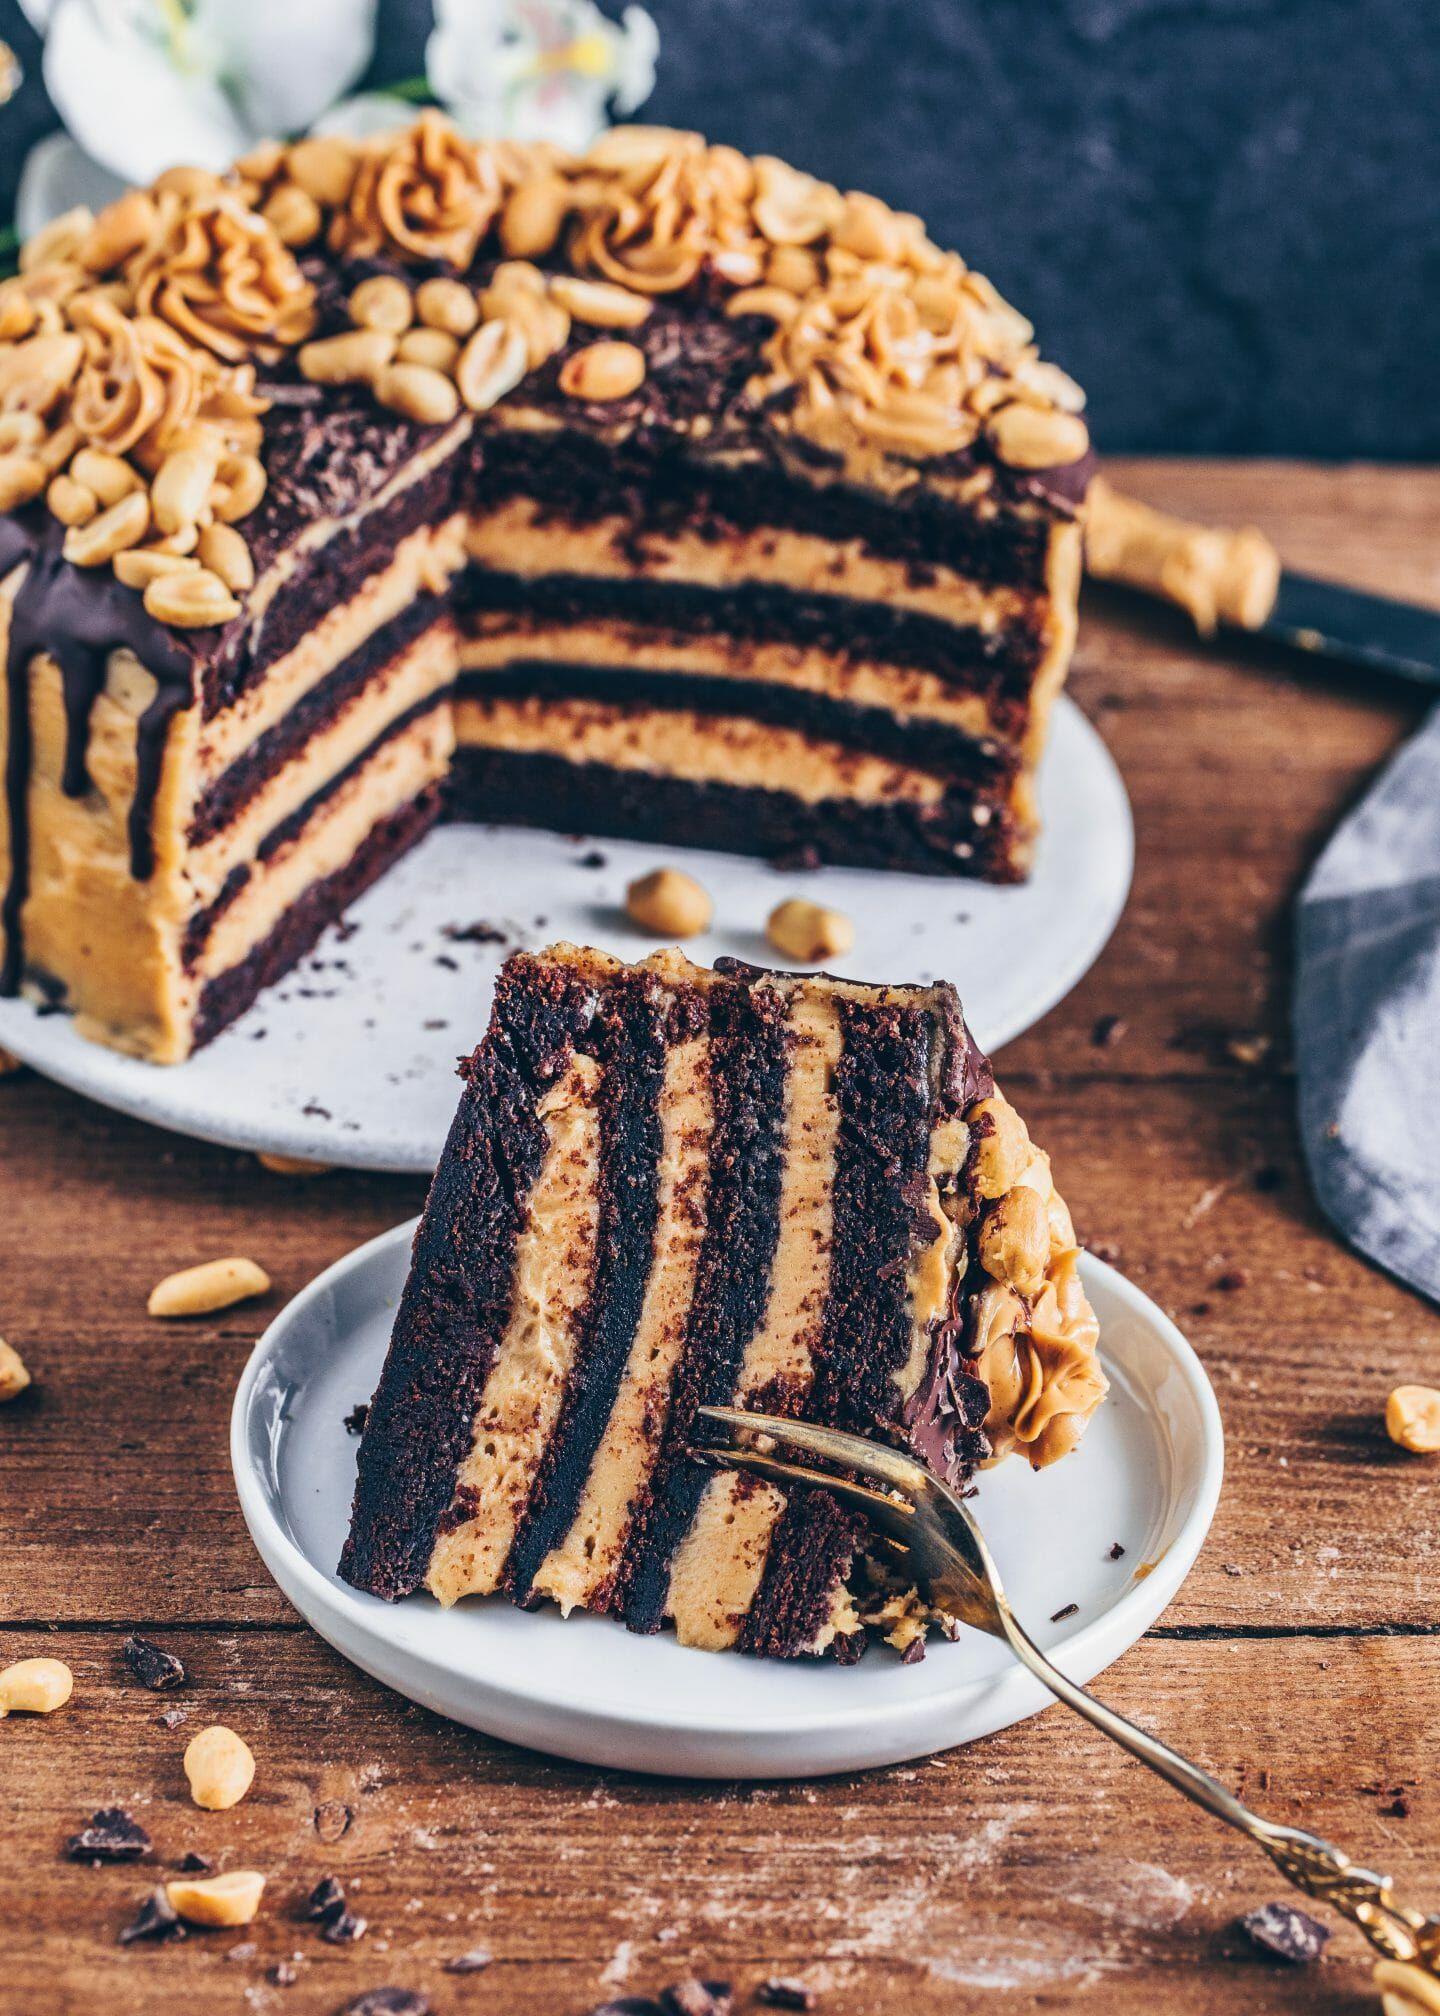 Erdnussbutter Schokoladen-Torte - Vegan - Bianca Zapatka | Rezepte